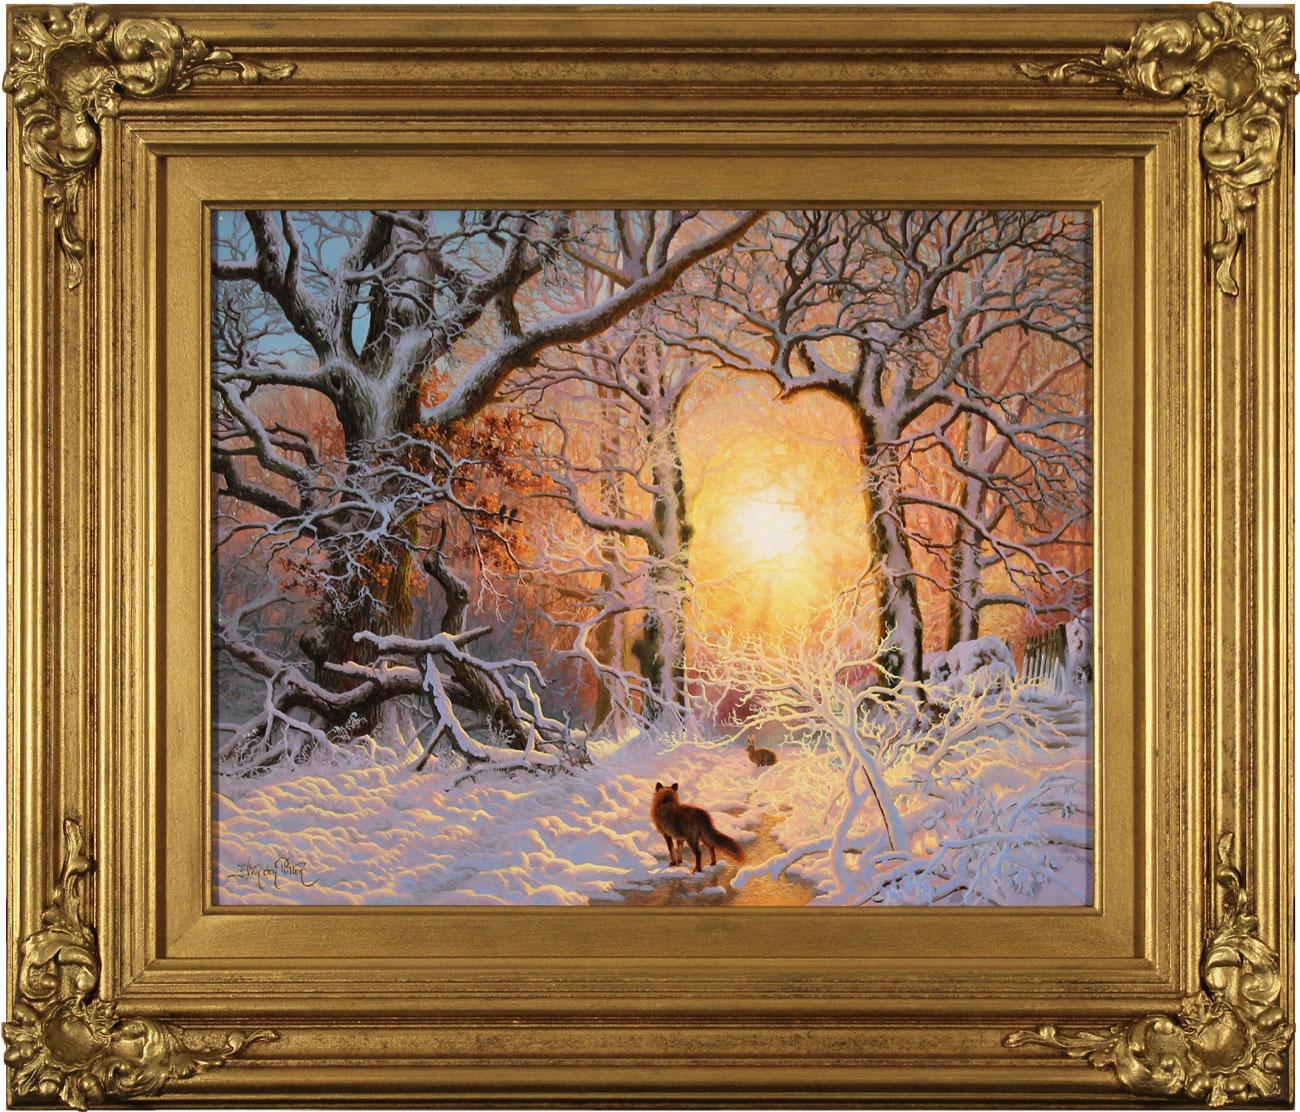 Daniel Van Der Putten, Original oil painting on panel, Fox in Mantles Heath Wood Click to enlarge